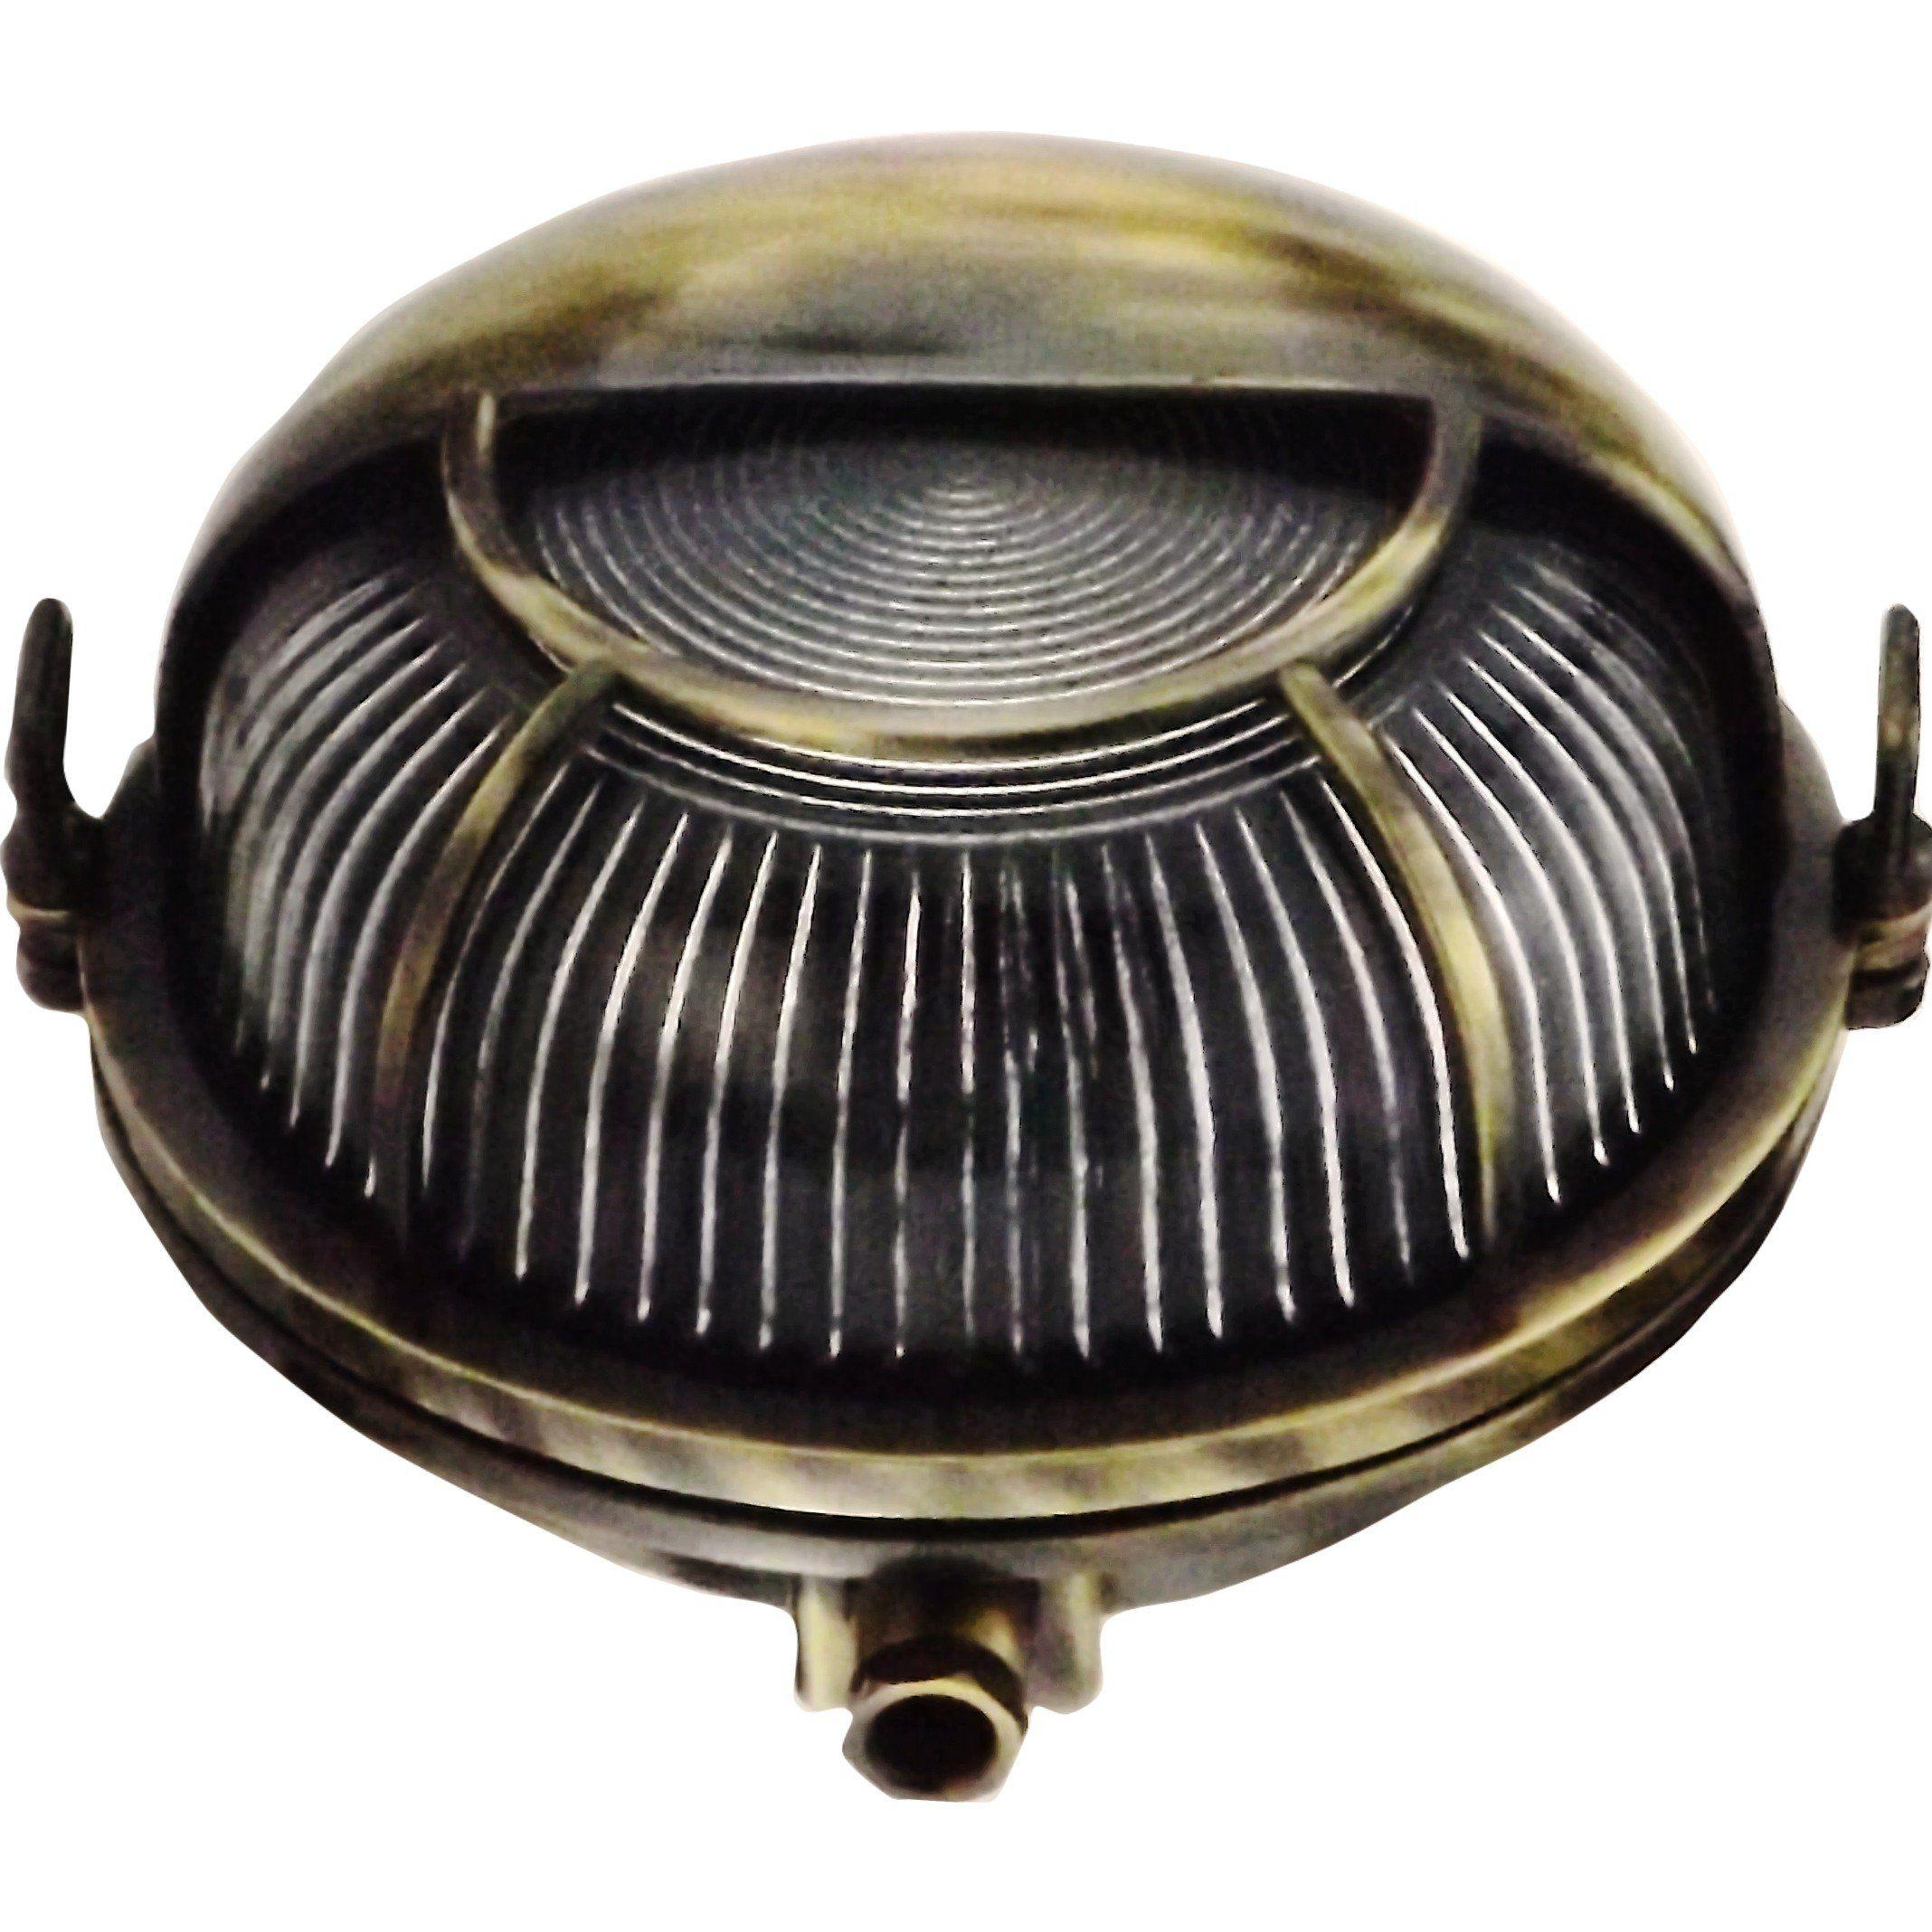 c4429056c6f Orbis compact Brass bulkhead Round outdoor waterproof light Nautical marine wall  lamp